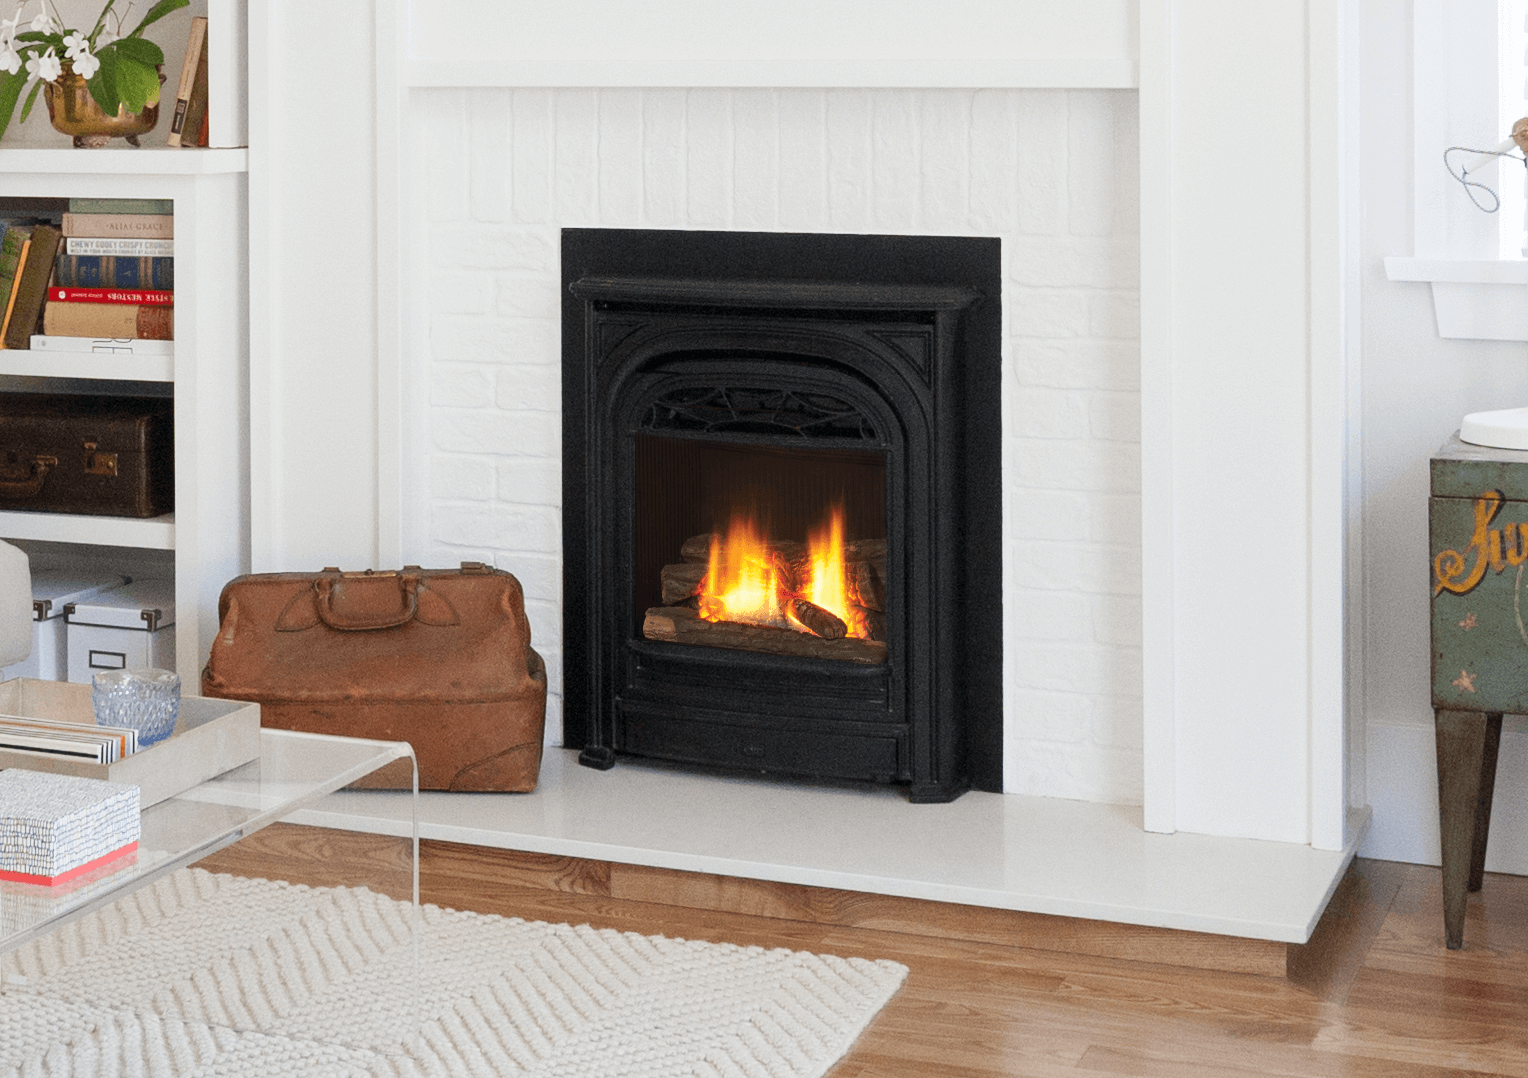 Valor Portrait Series Insert Gas Fireplace Toronto Best Price